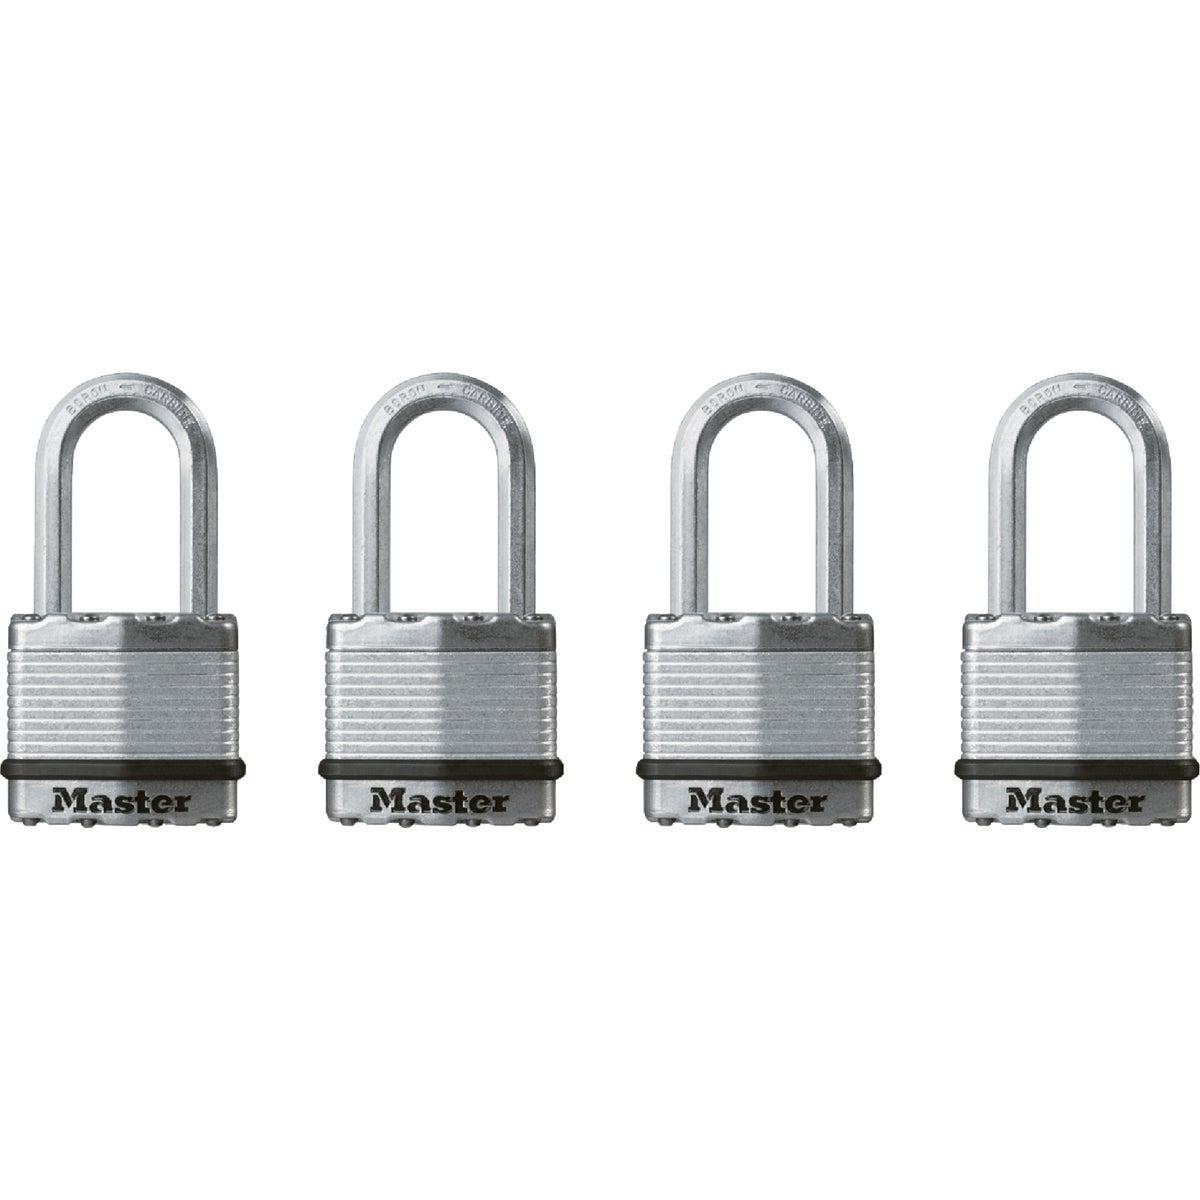 4PK 1-3/4 MAG LG PADLOCK - M1XQLF by Master Lock Company